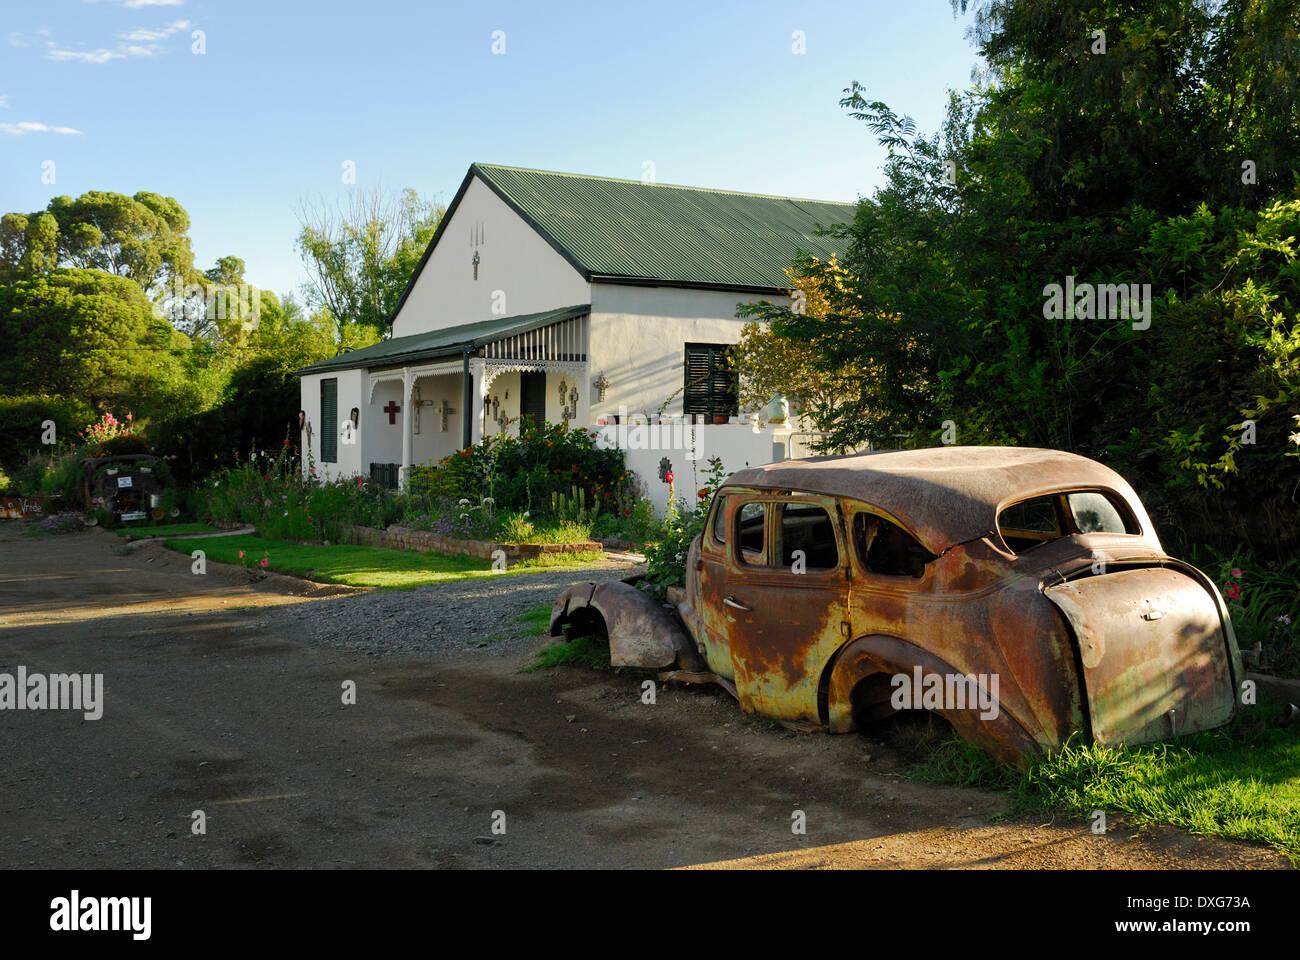 Scrap vintage car in a street in New Bethesda, Karoo, Eastern Cape - Stock Image